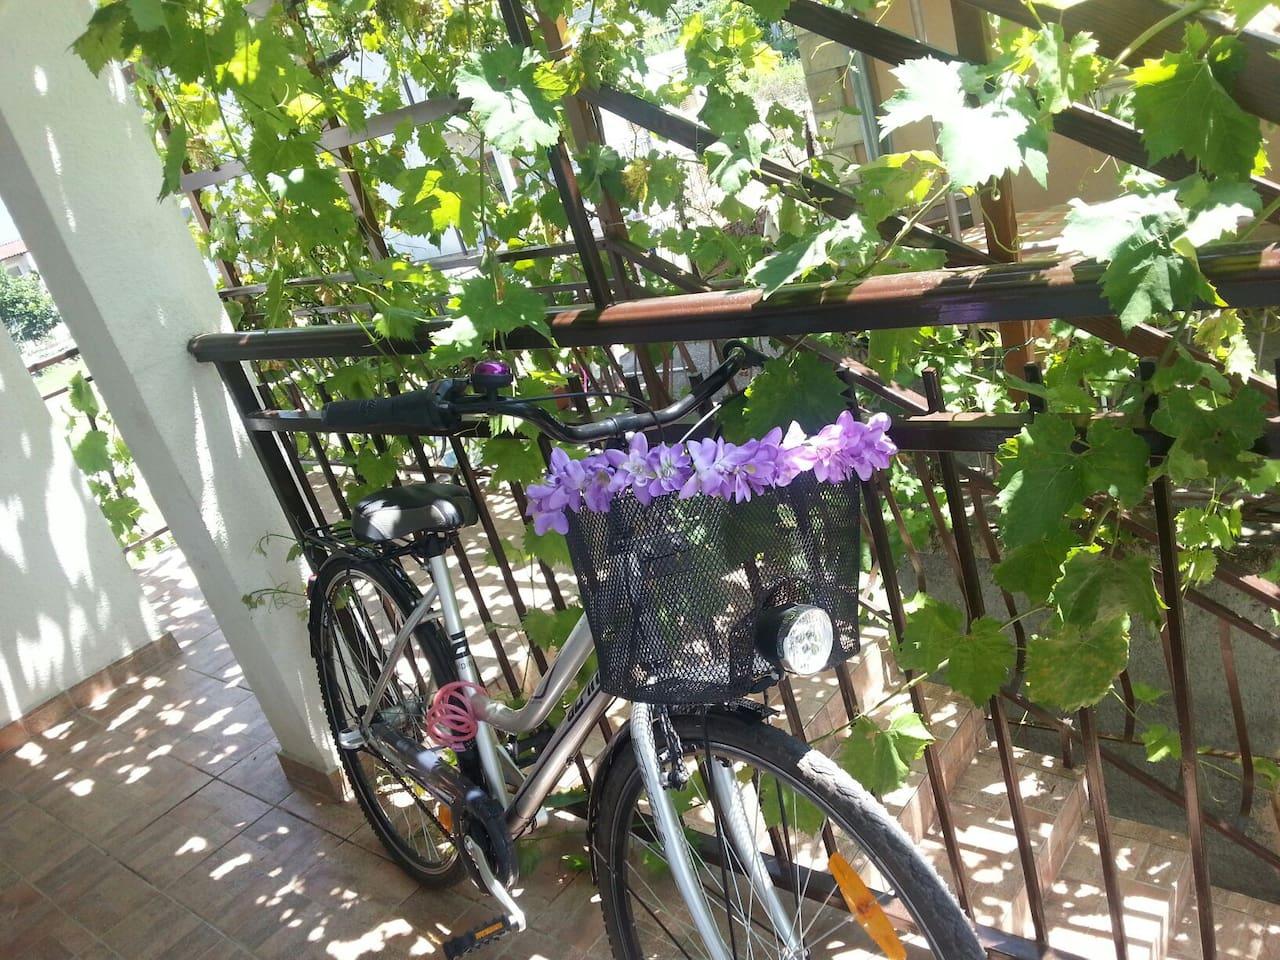 Balcony in grapes